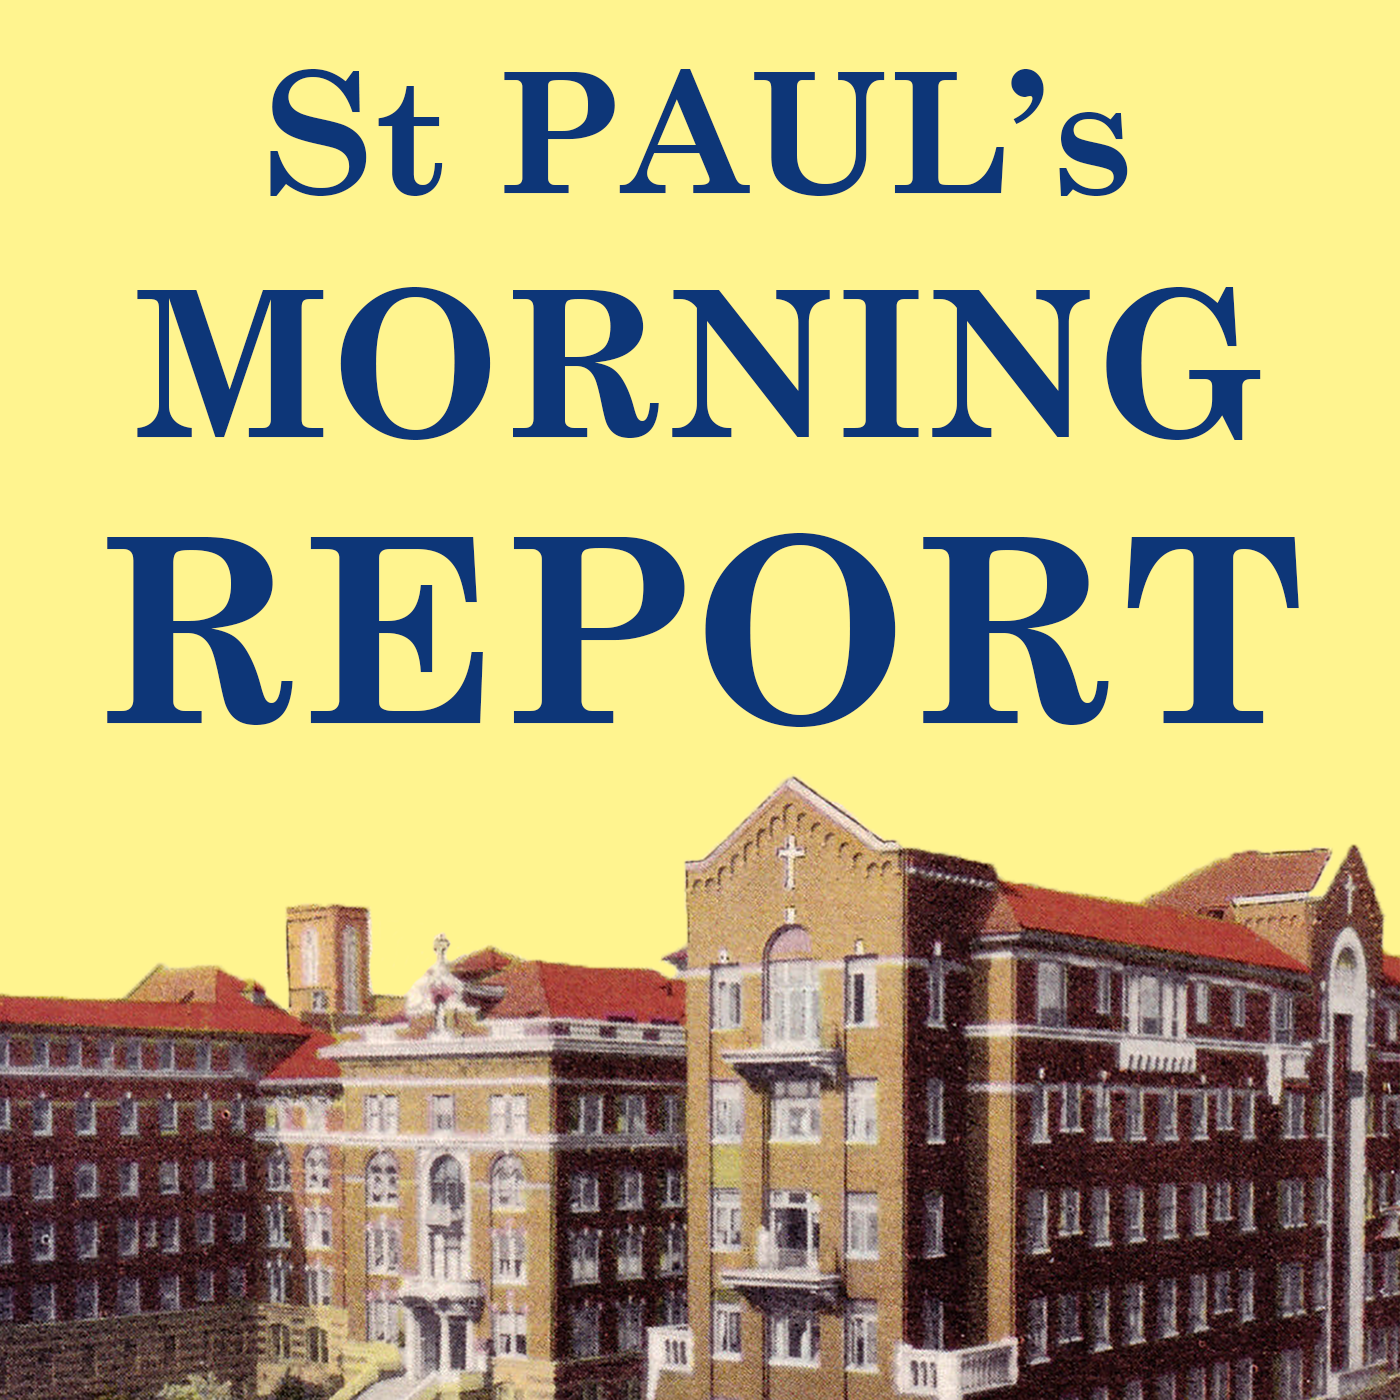 St. Paul's Morning Report